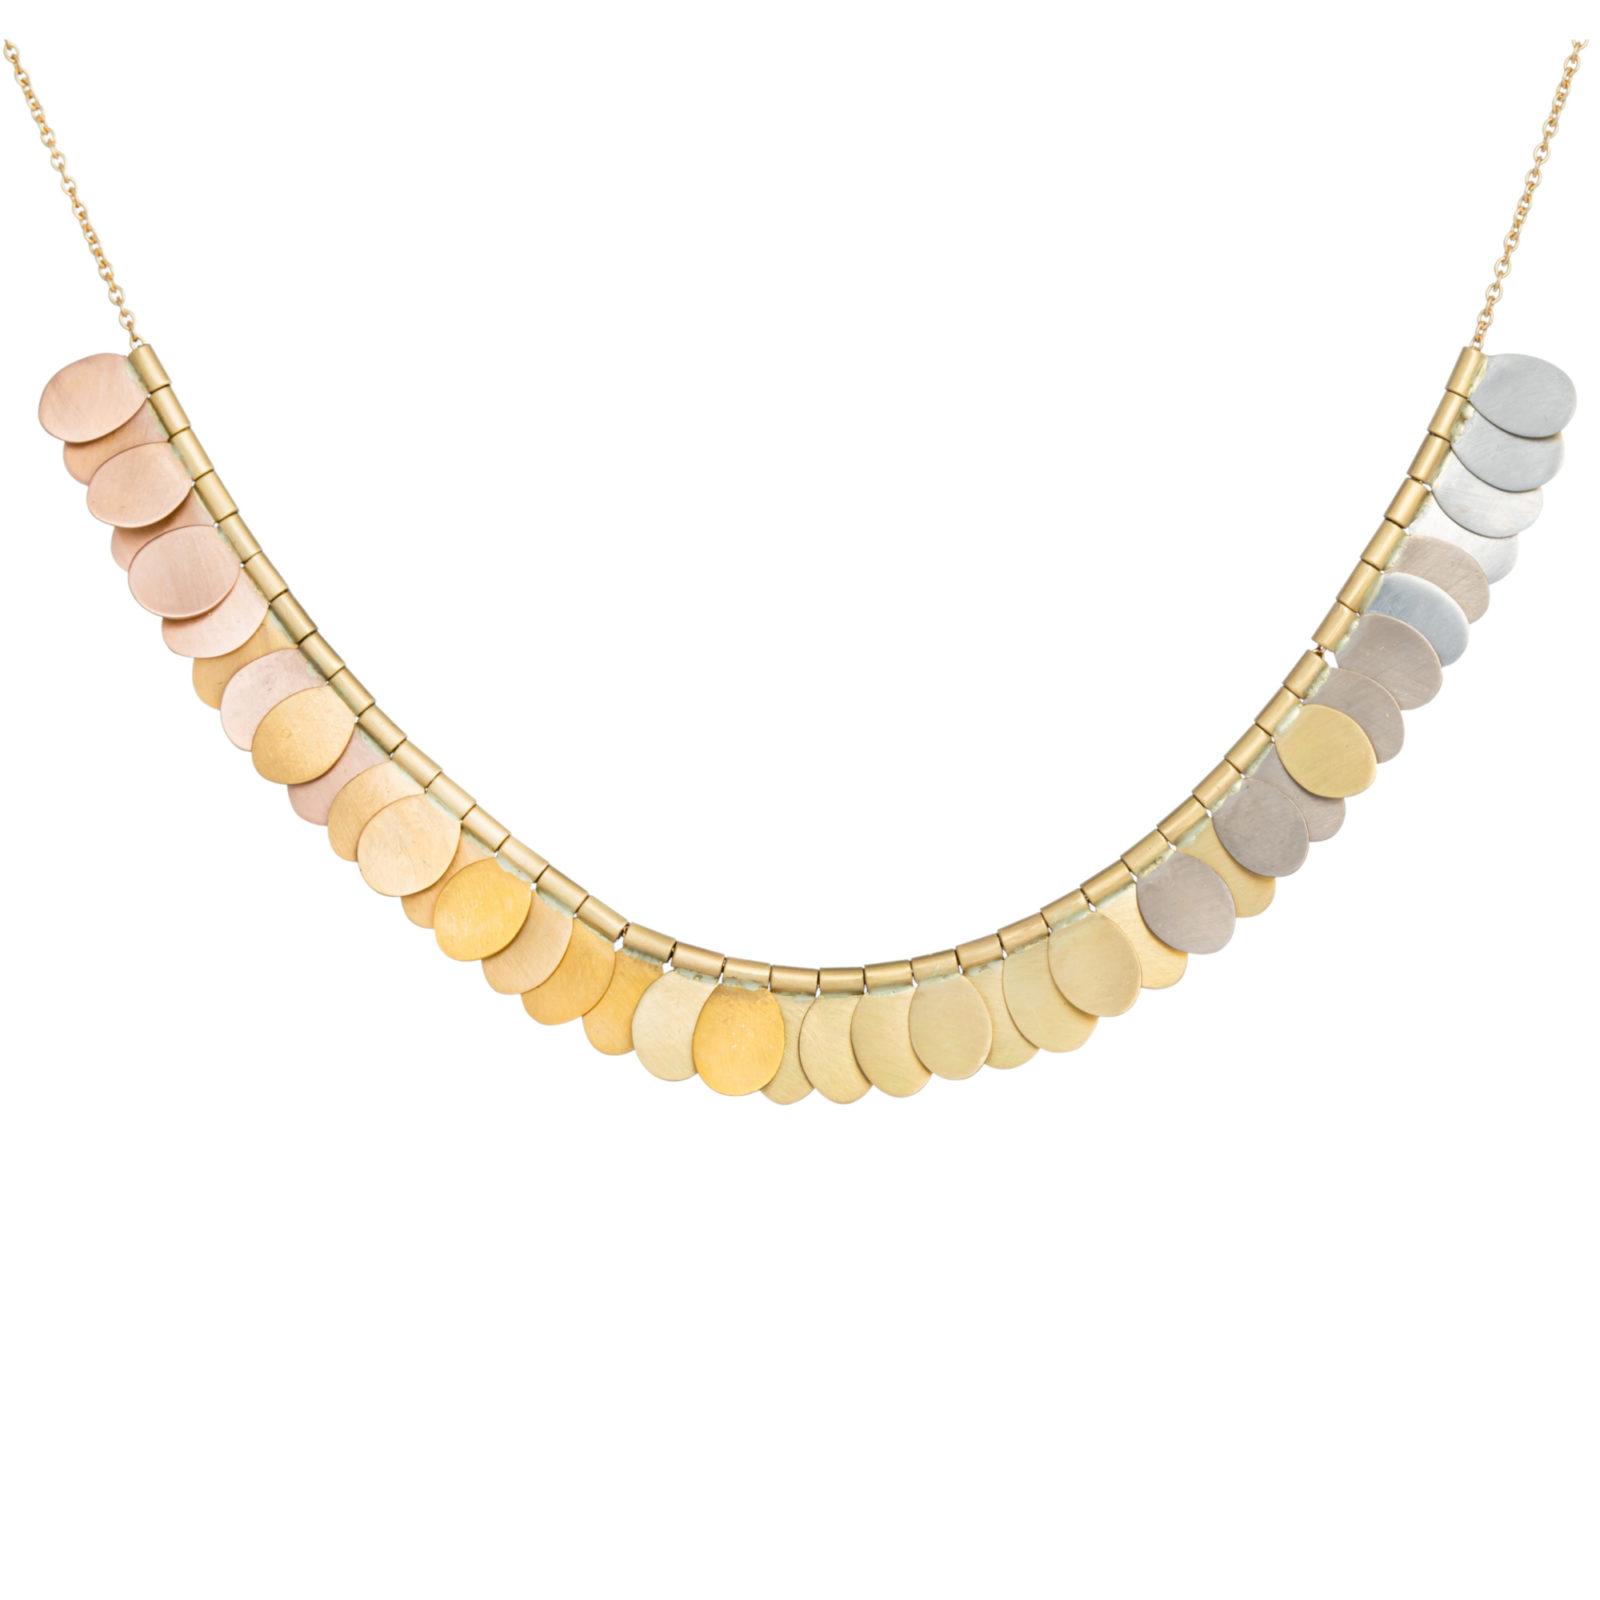 Sia Taylor FN1 YRAIN Rainbow Gold Necklace Back WB